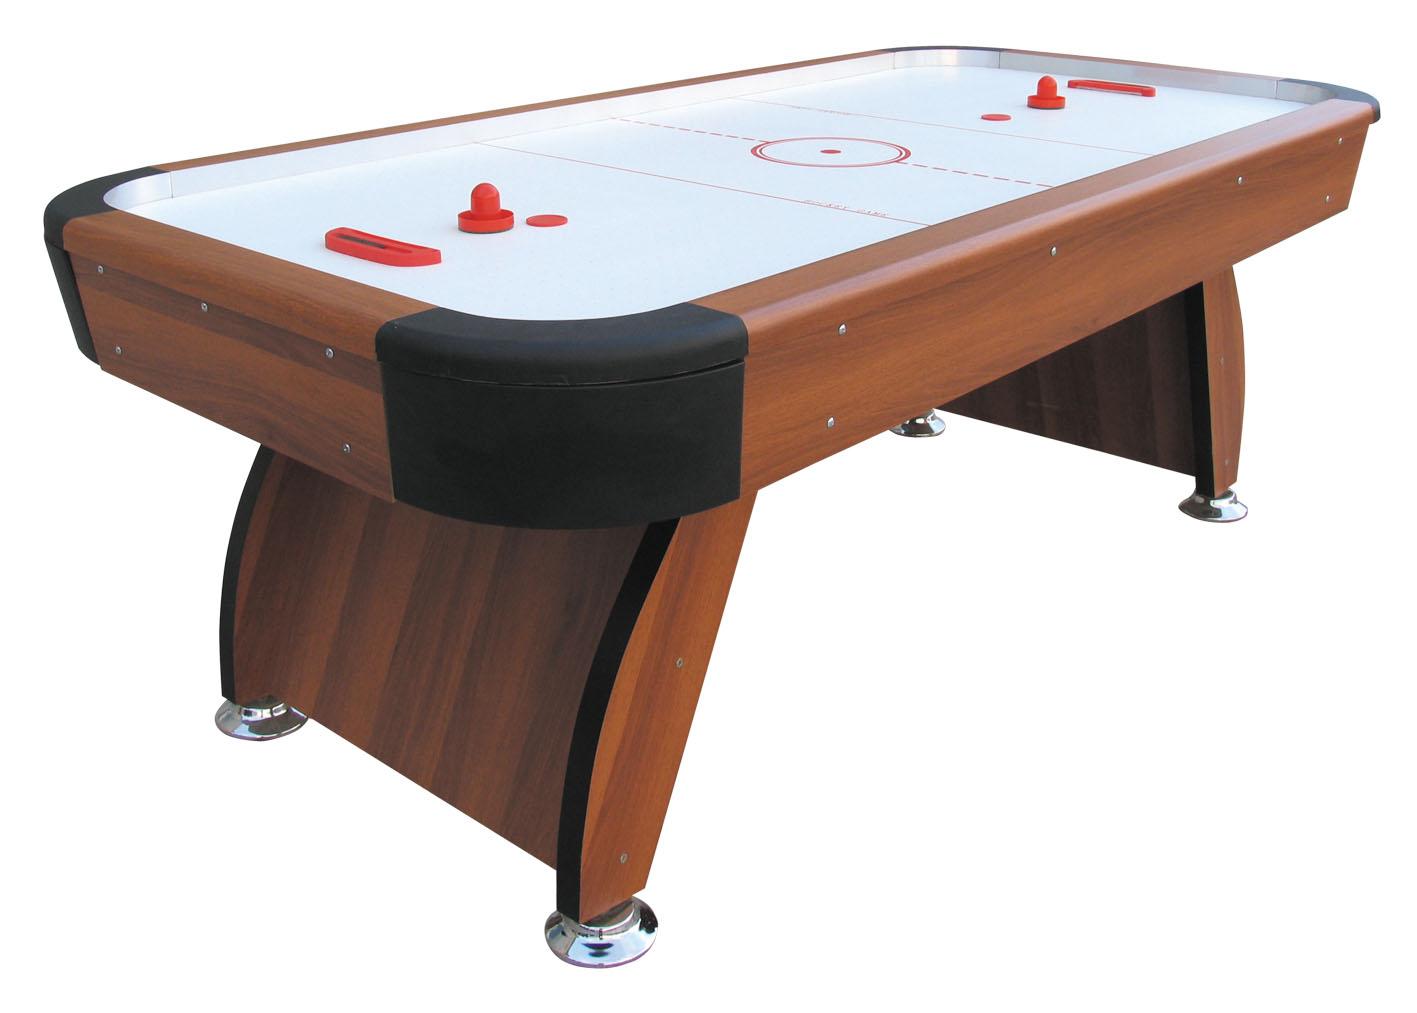 Charming Air Hockey Tables,Ht 016   Buy Air Hockey Tables Product On Alibaba.com